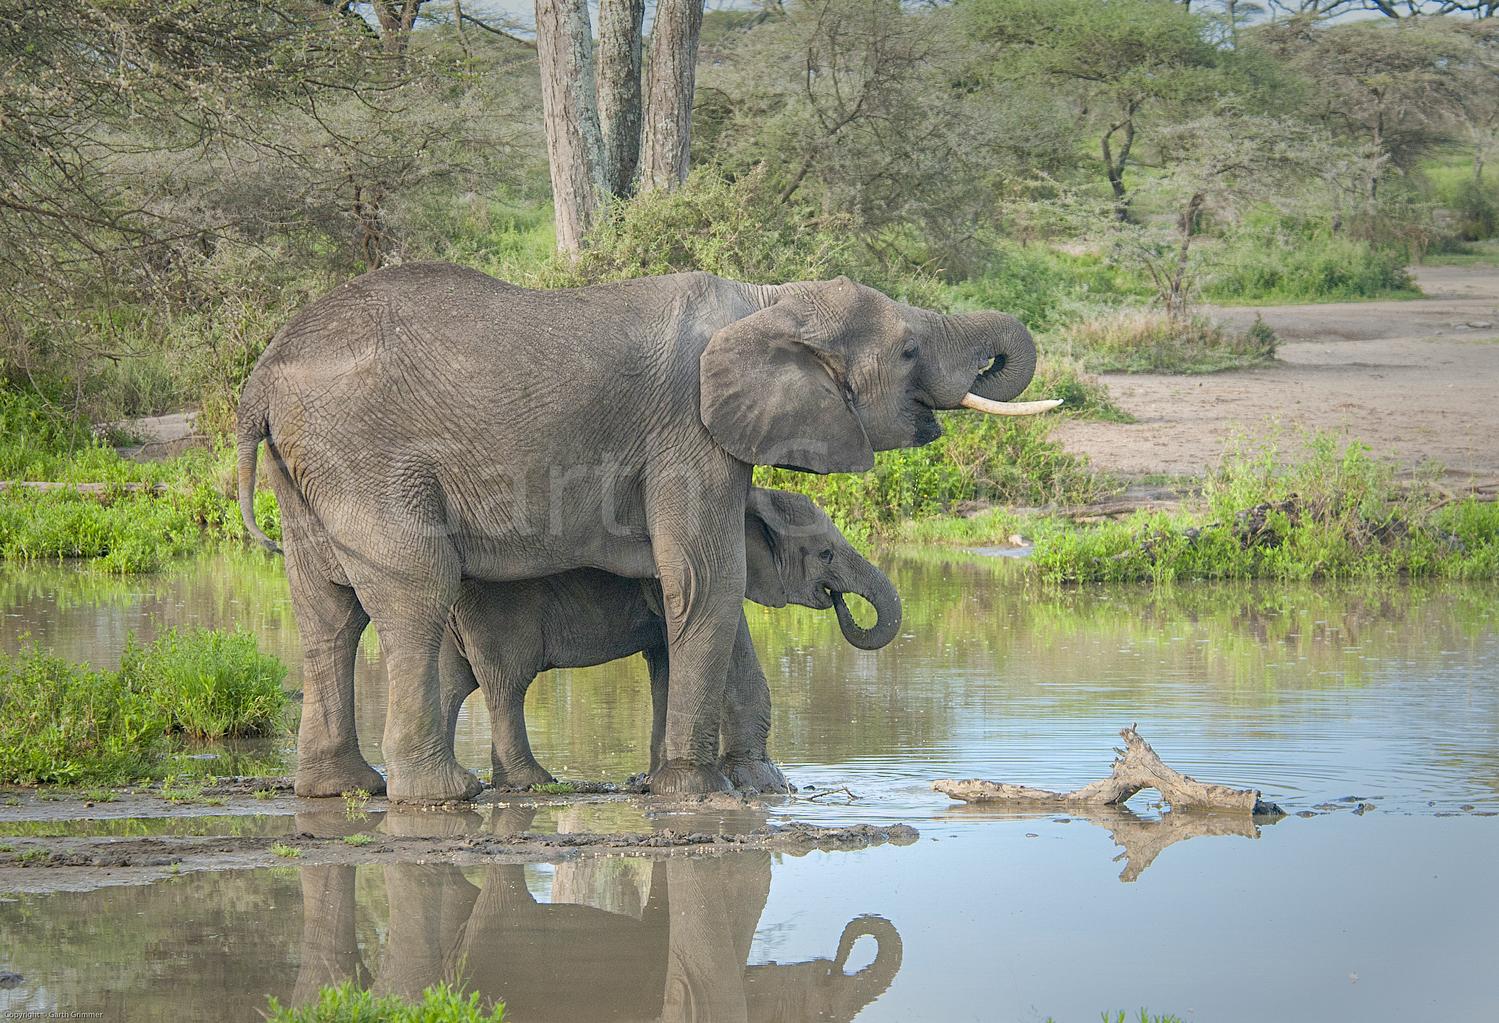 Elephants at waterhole-Lake Masek, Tanzania